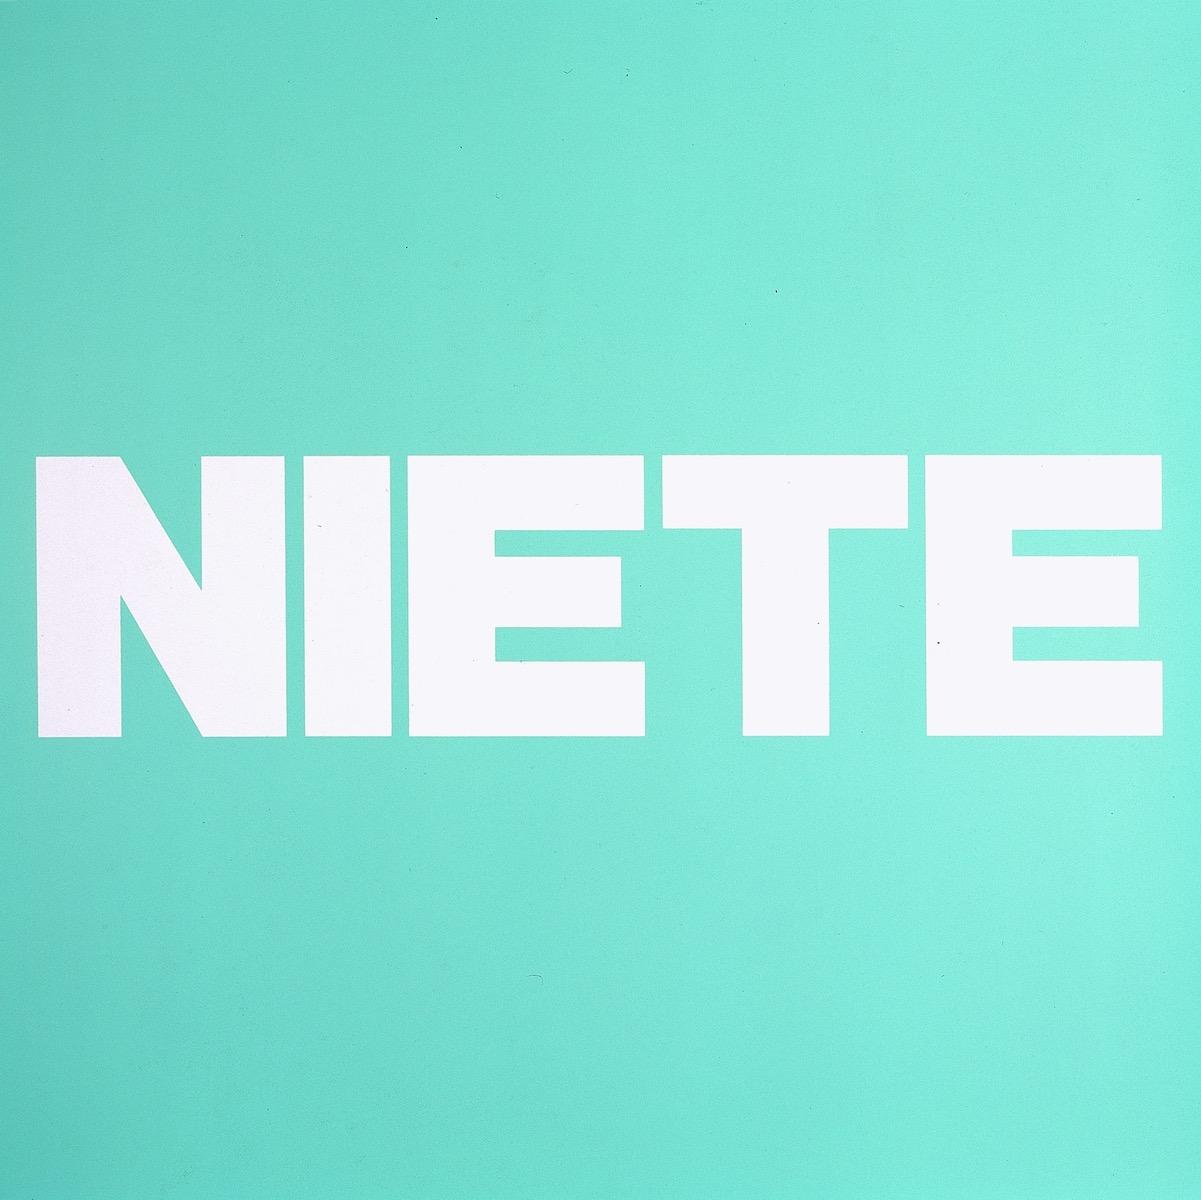 NIETE, GRÜN | Affirmation tut gut | Angelika Beuler | 1992